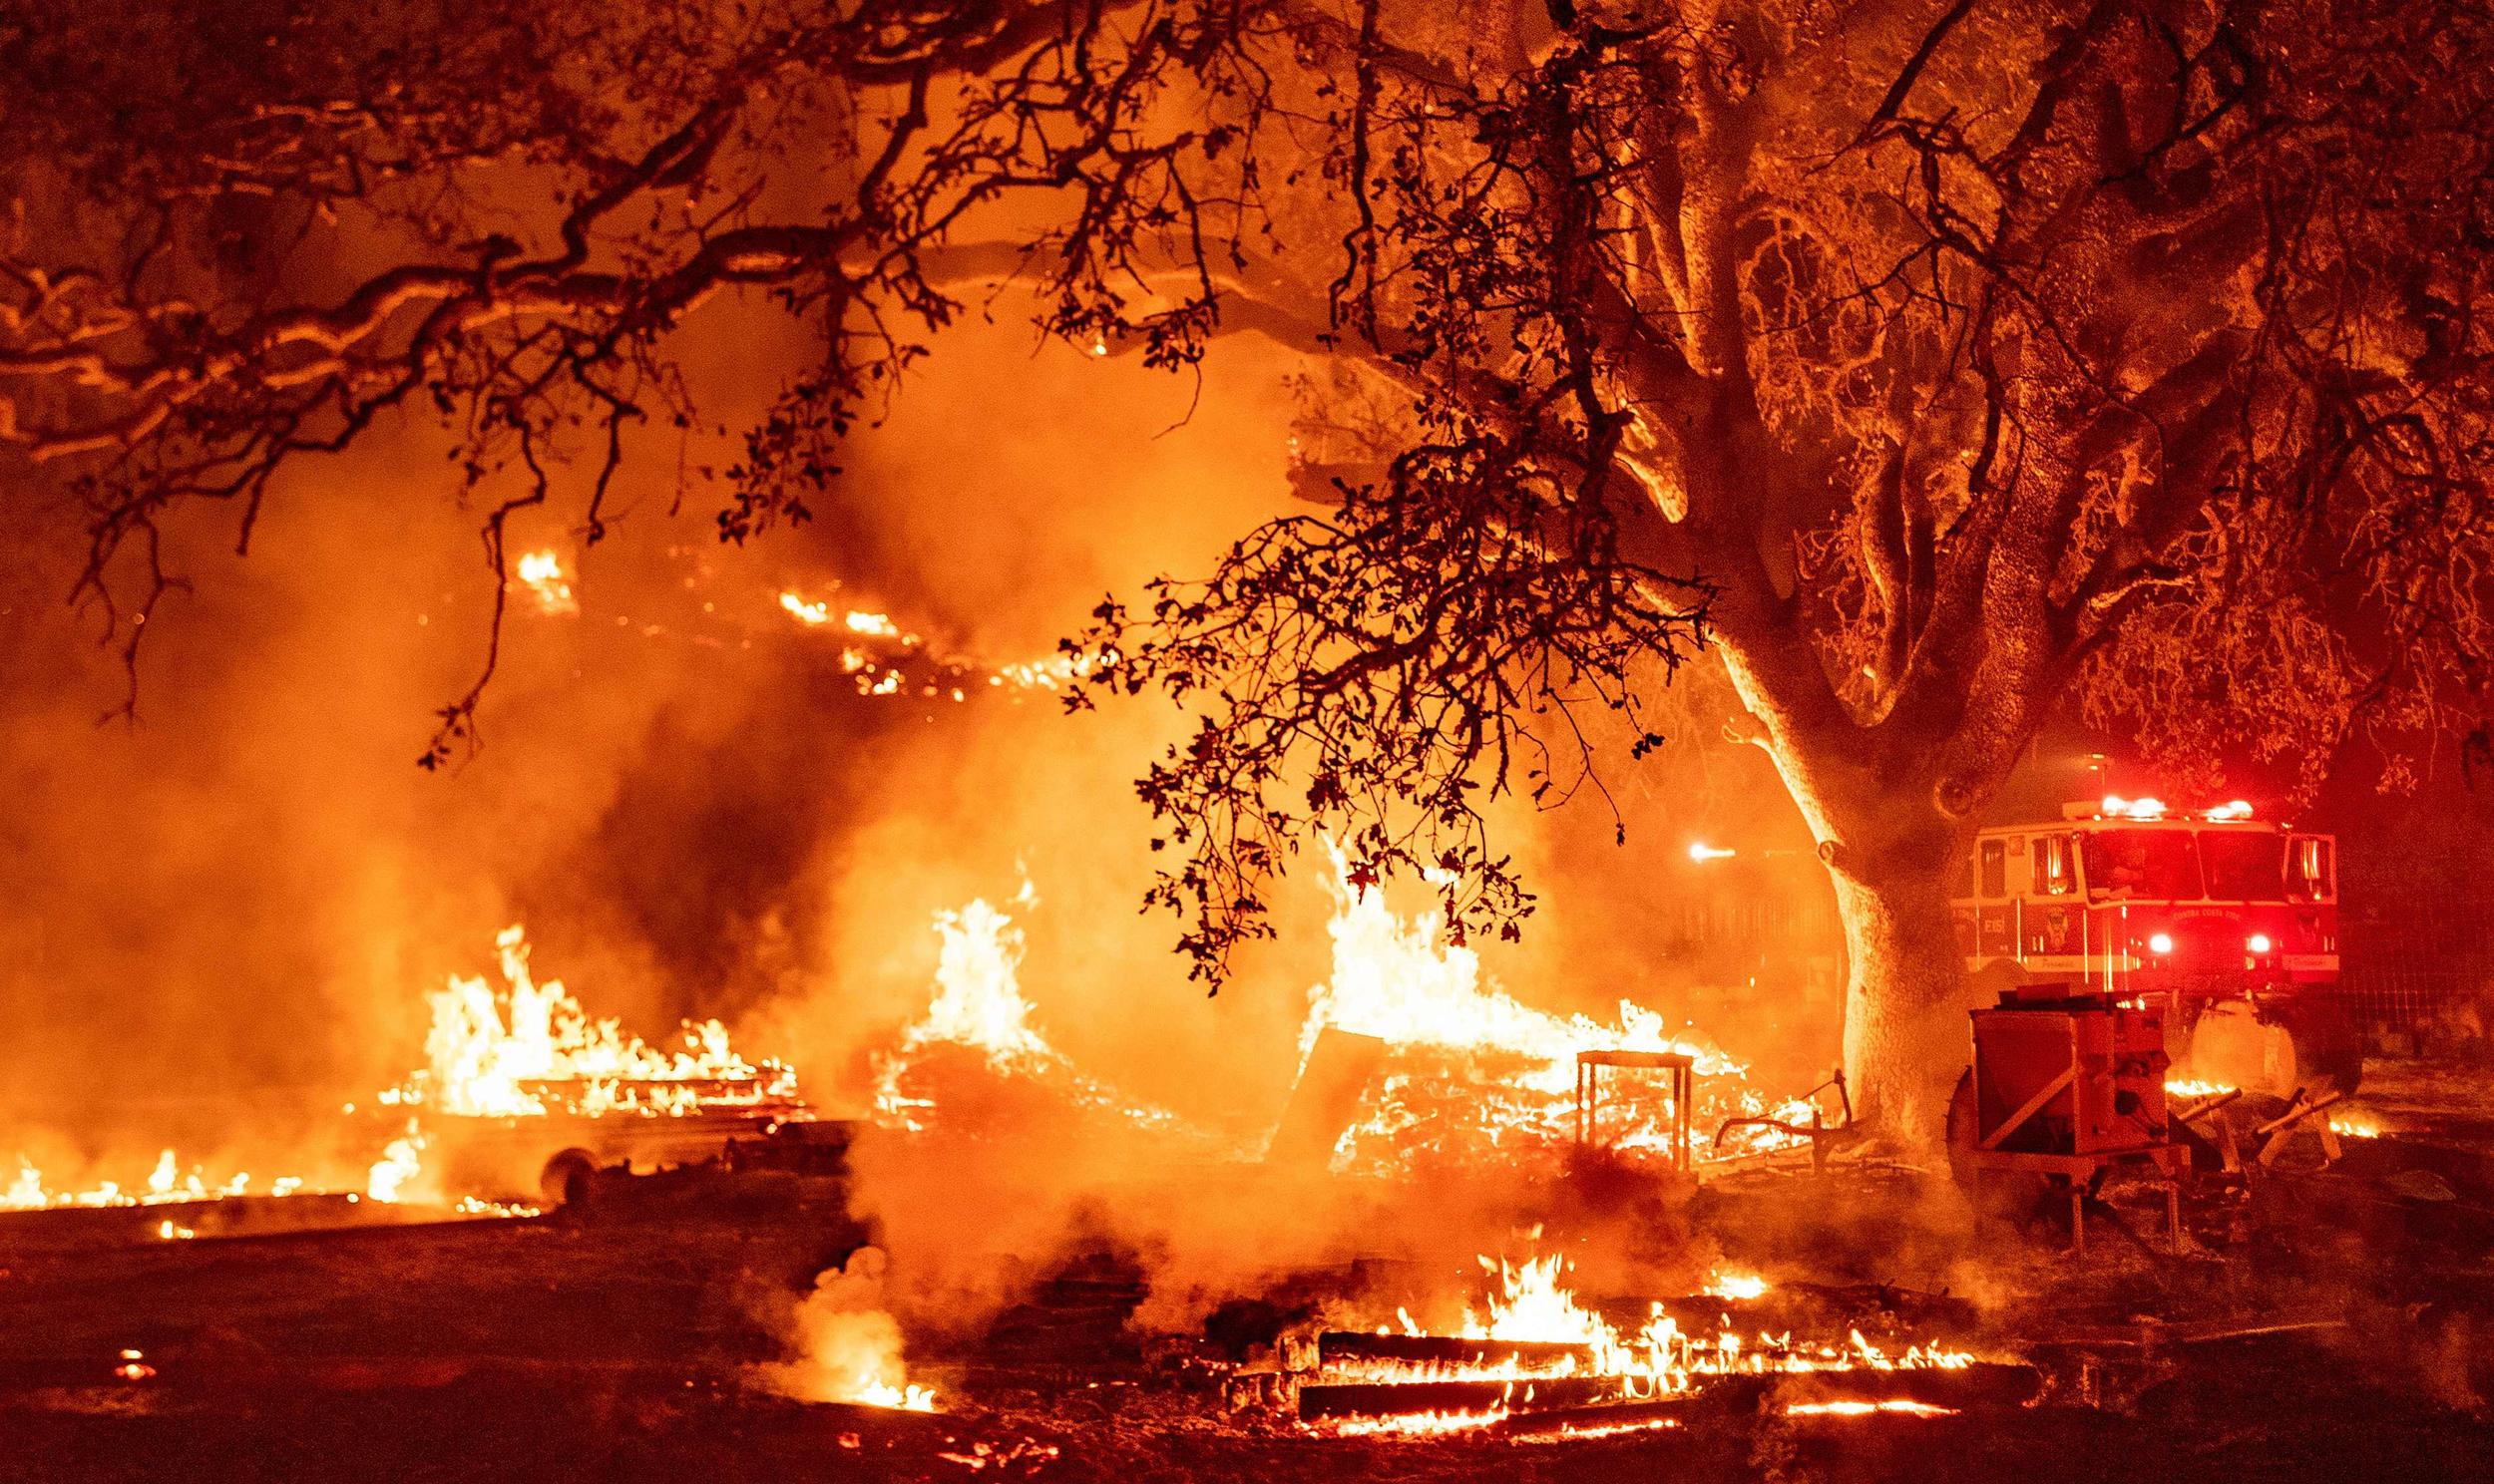 lupita-nyongo-emmy-nomination-wildfire-apple-fire-california-dortmund-sancho-latest-news-global-world-stories-monday-august-2020-style-rave